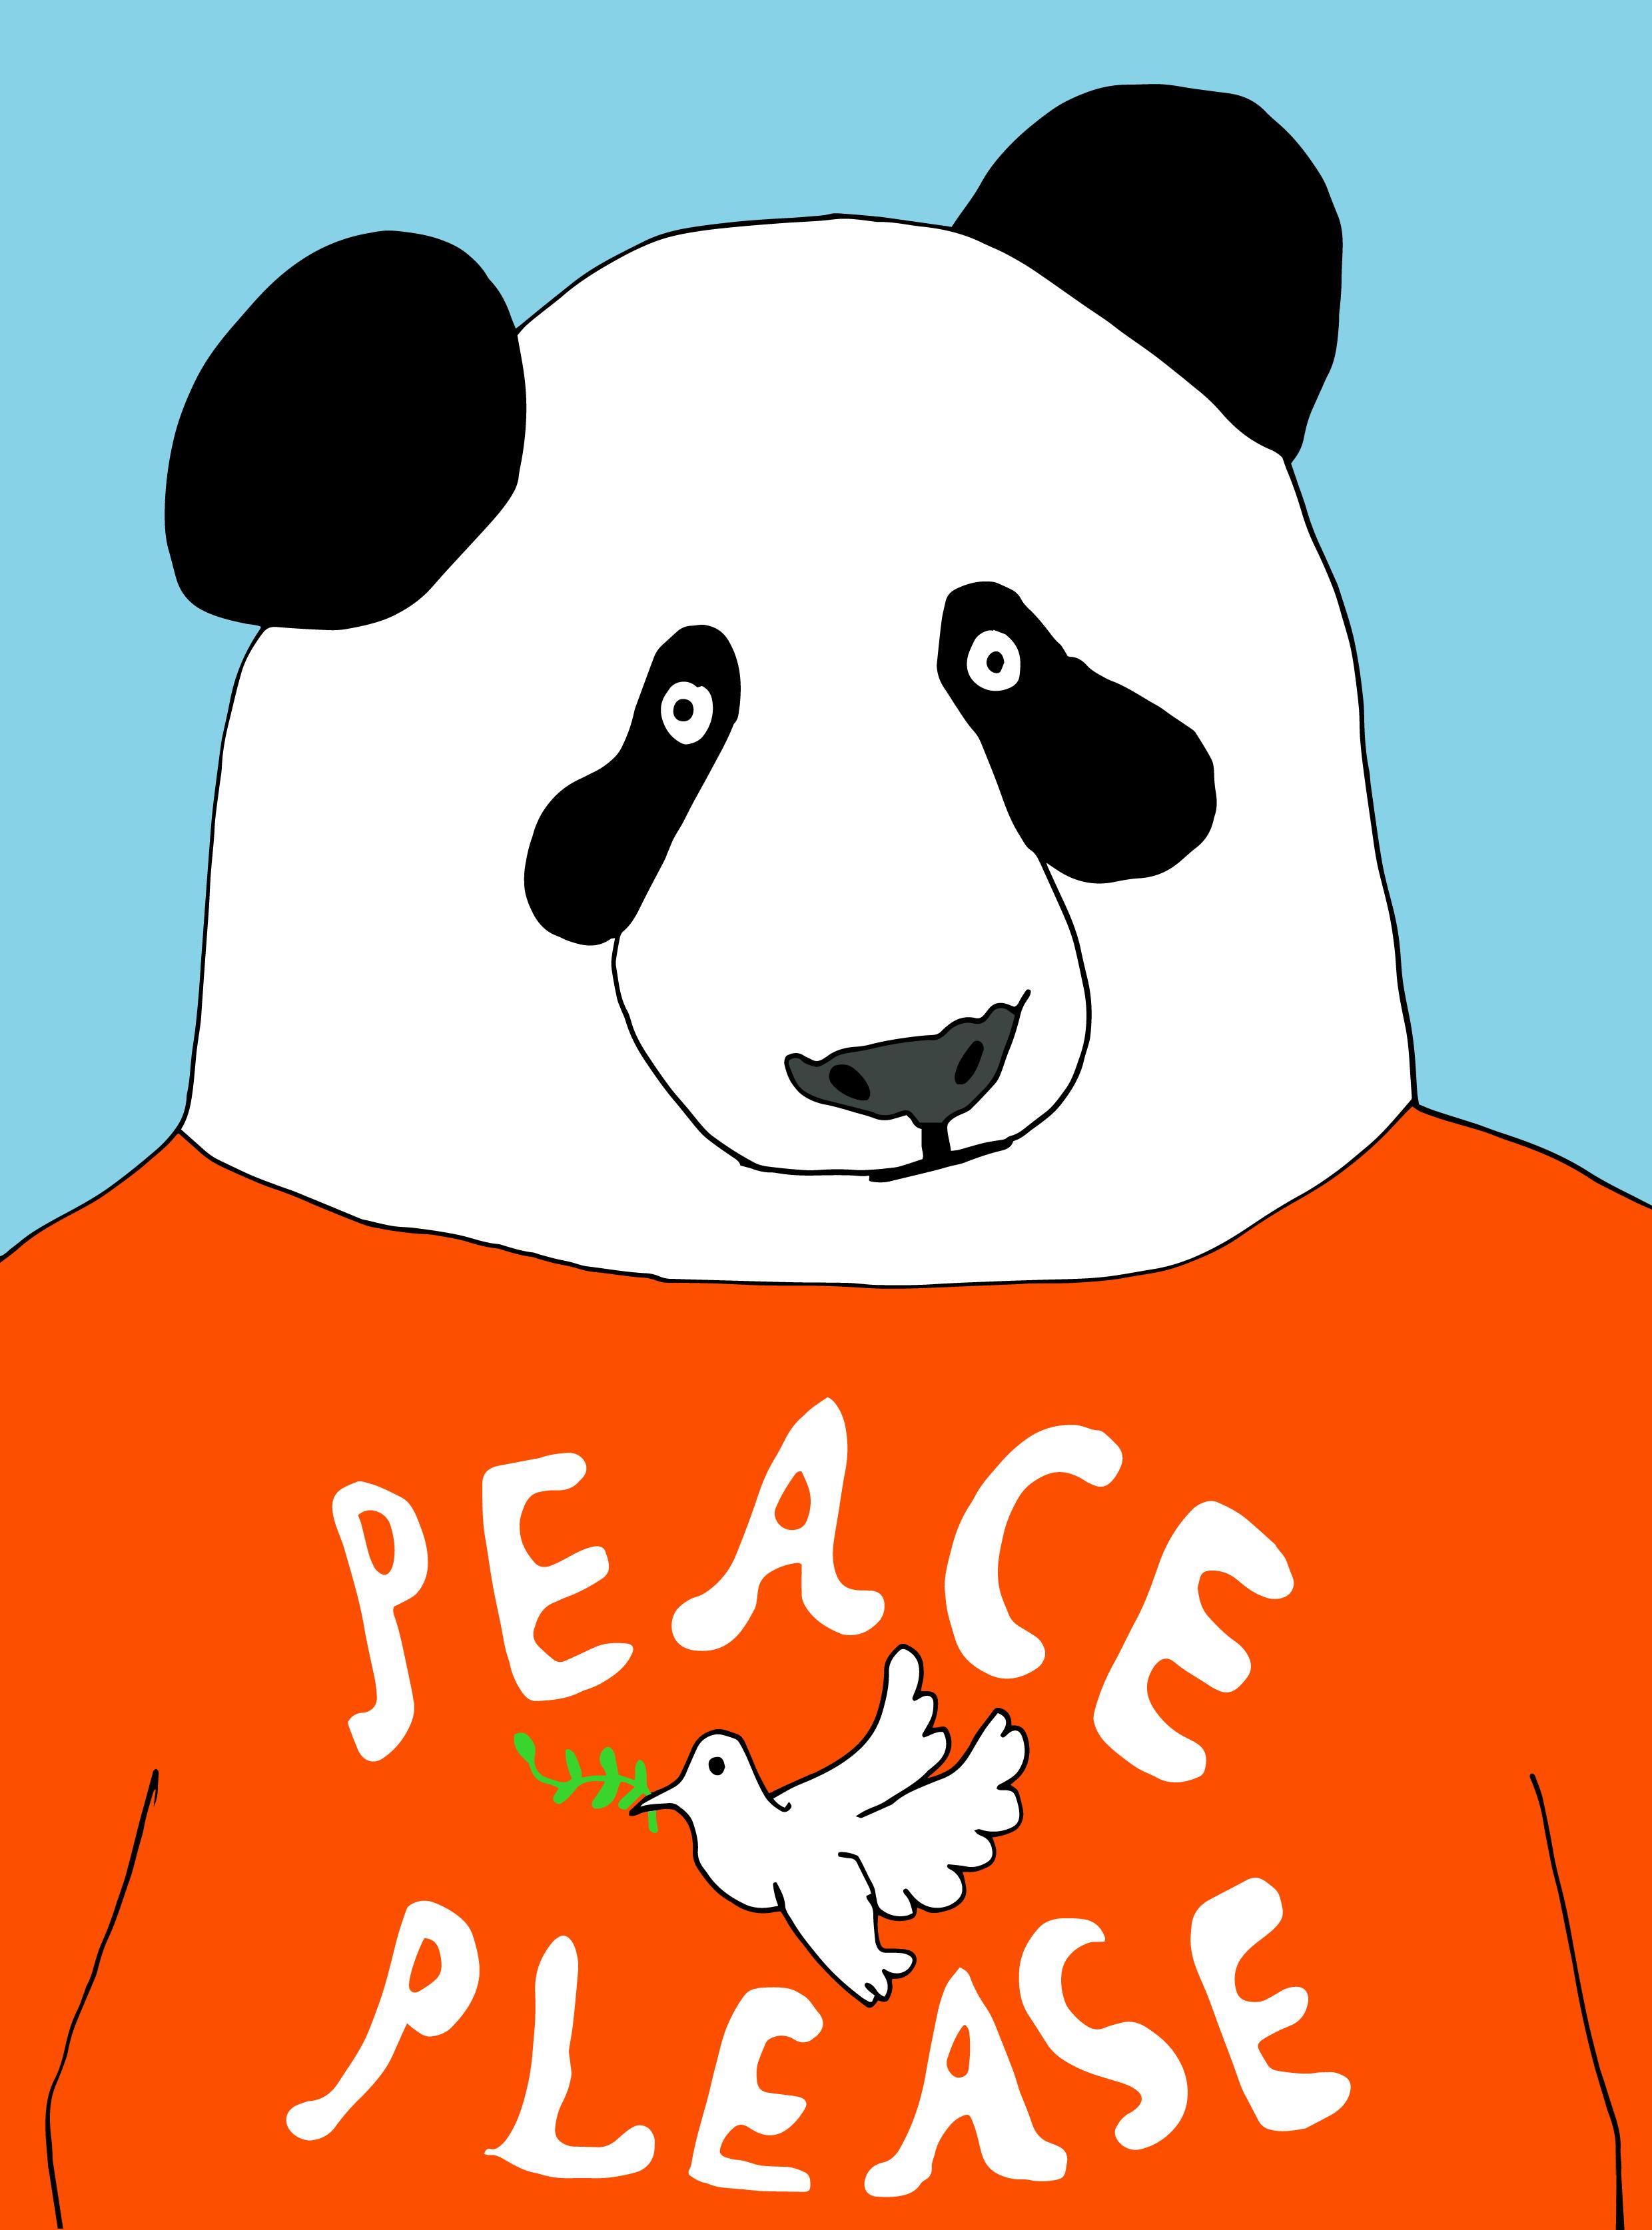 Peace Please / 2016